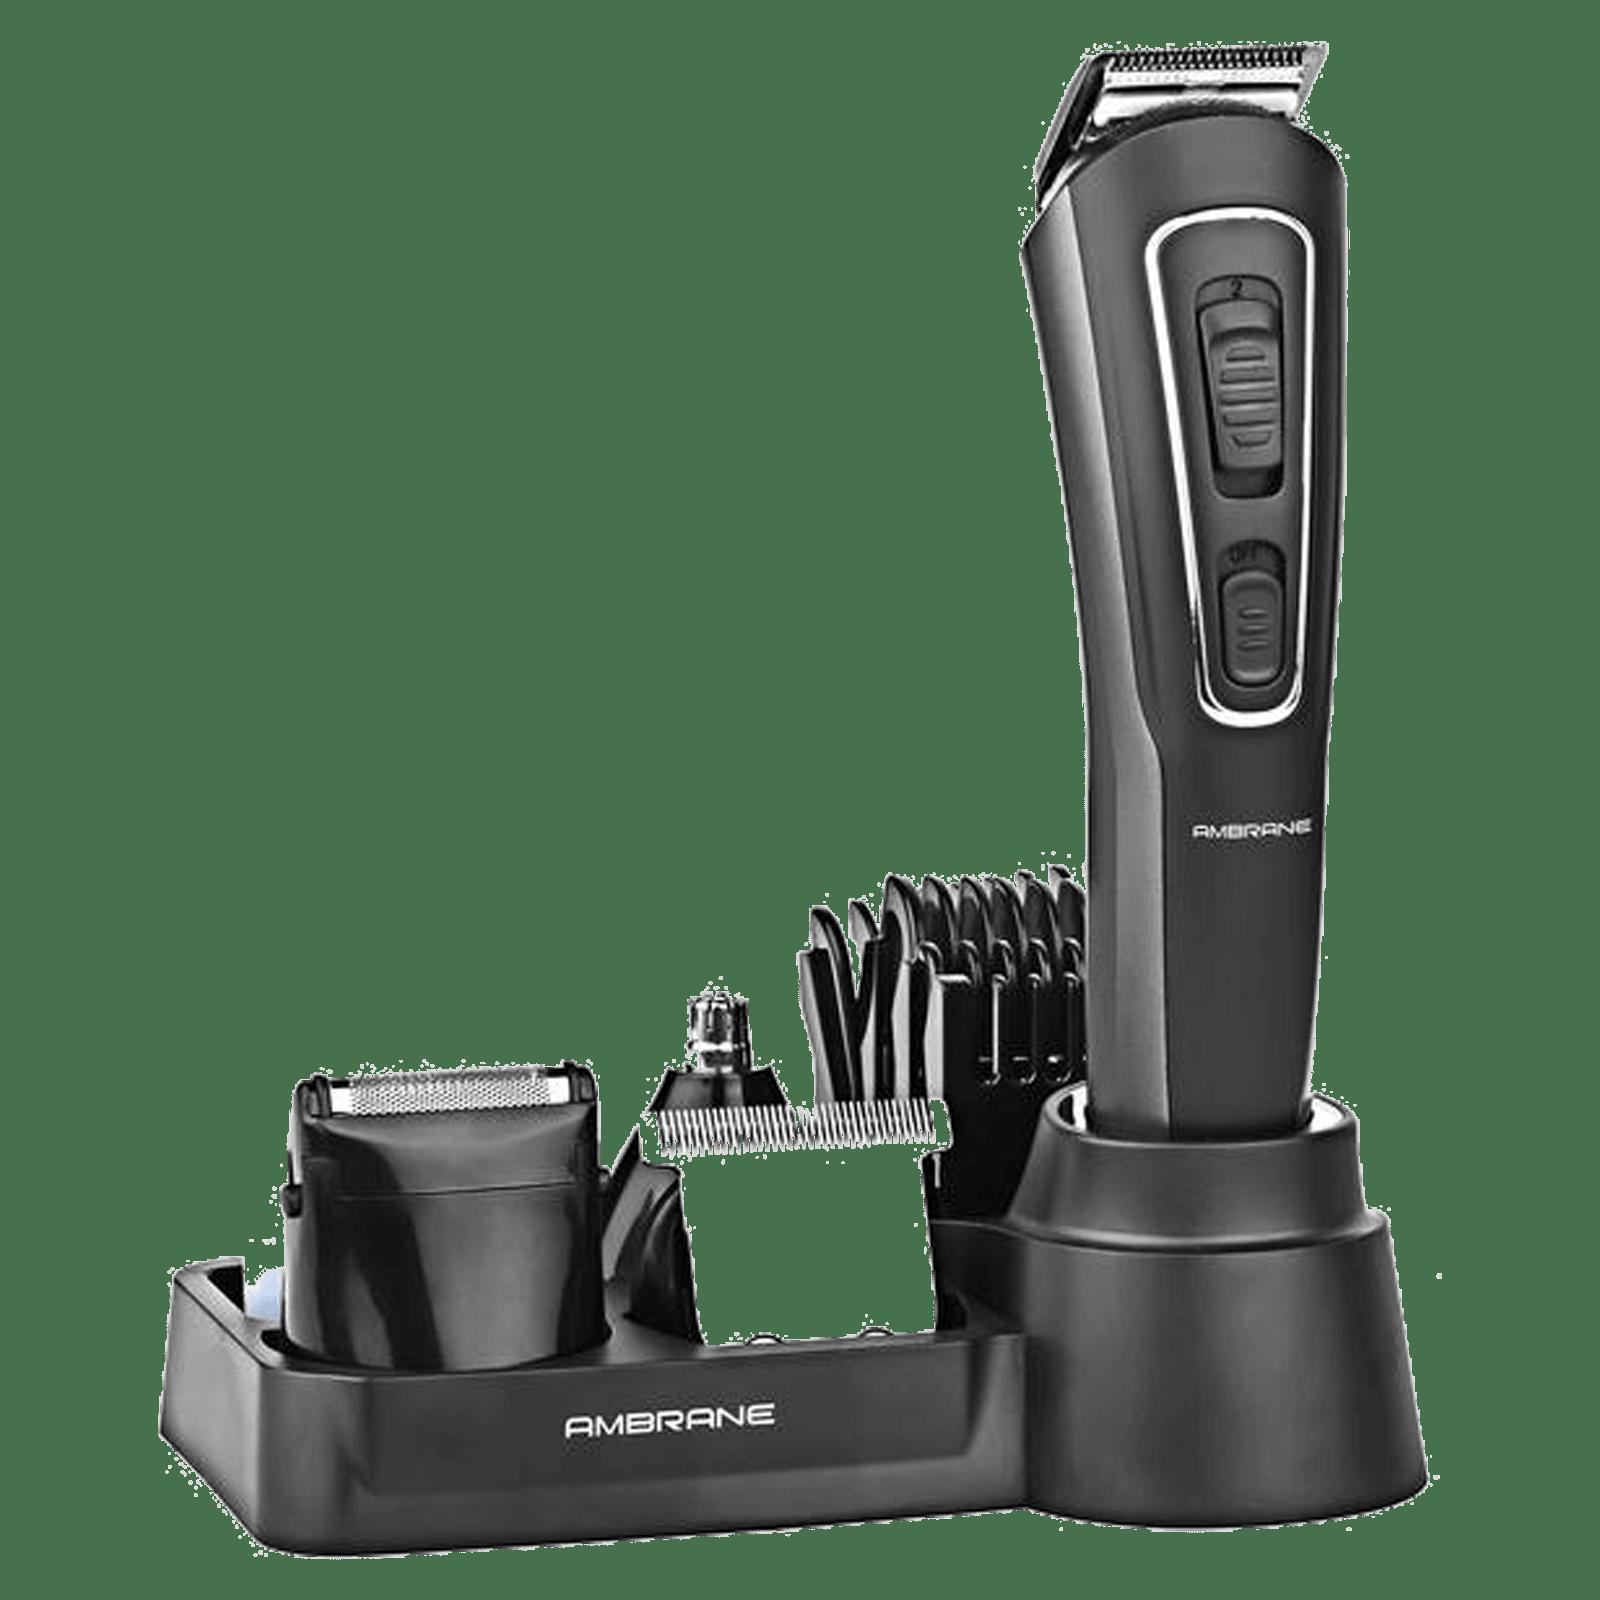 Ambrane Cruiser Lite Stainless Steel Blades 9-in-1 Grooming Kit (LED Indicator Light, Black)